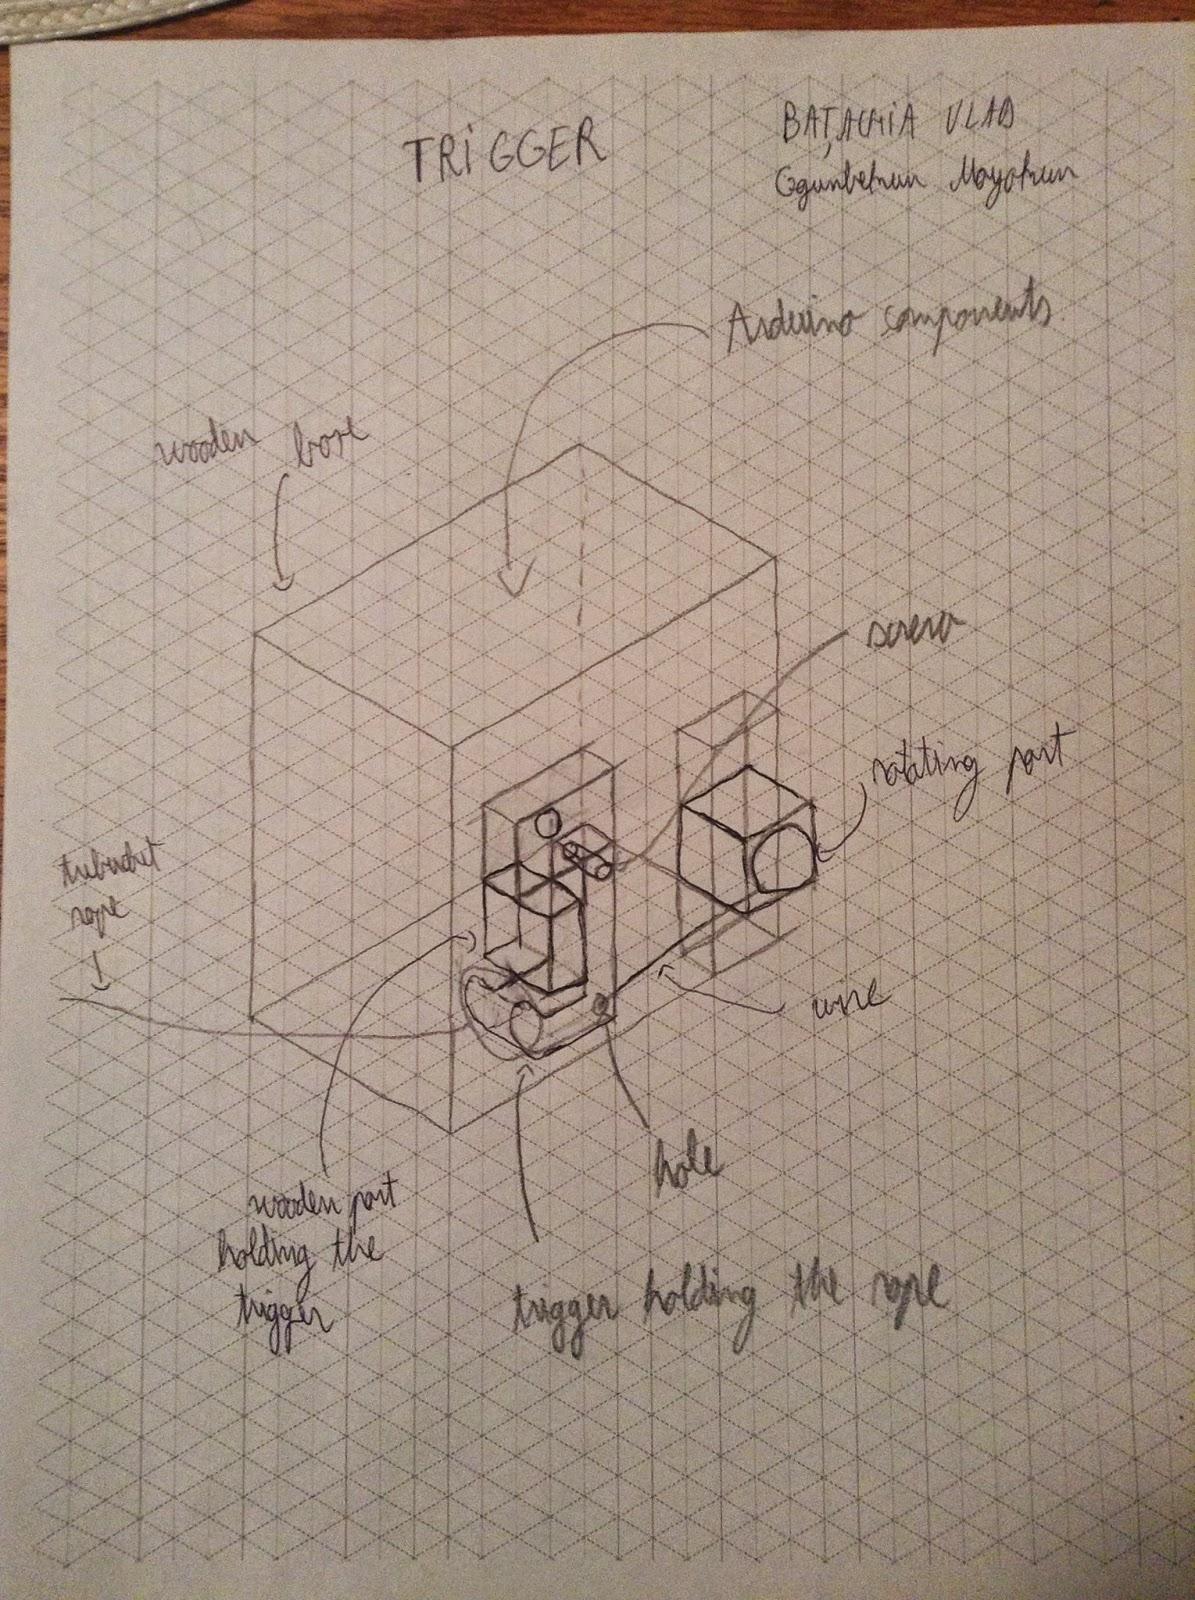 Mmae 232 Mayokun Ogunbekun Trebuchet Project For Design Class Diagram Of Our Trigger